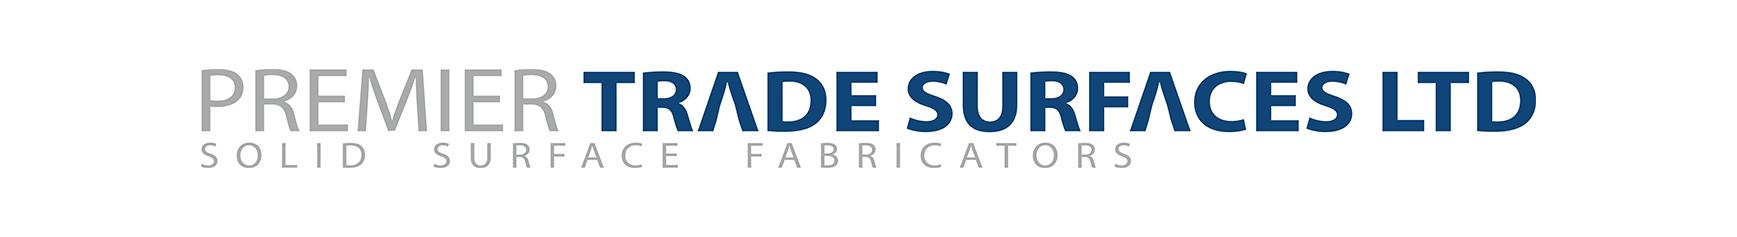 Premier Trade Surfaces